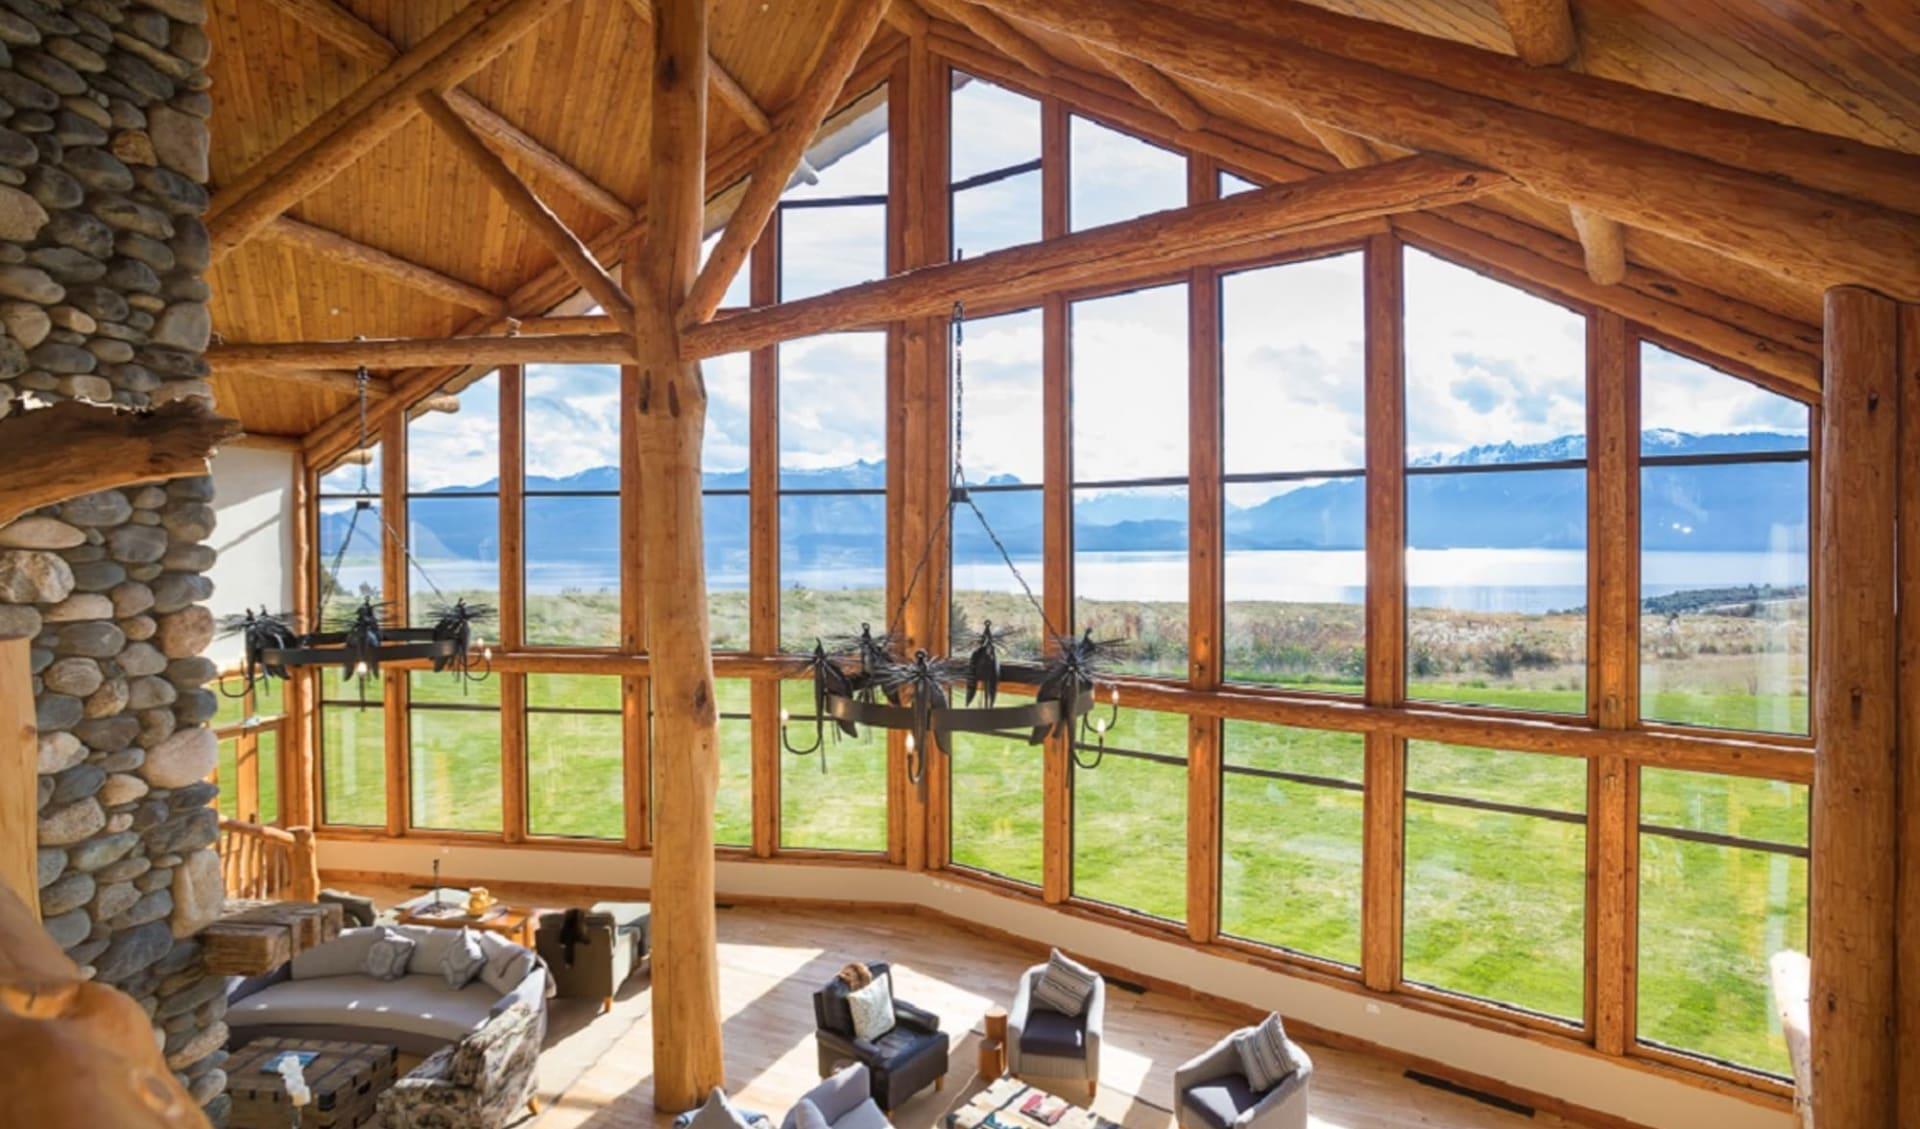 Fiordland Lodge in Te Anau:  Fiordland Great Room